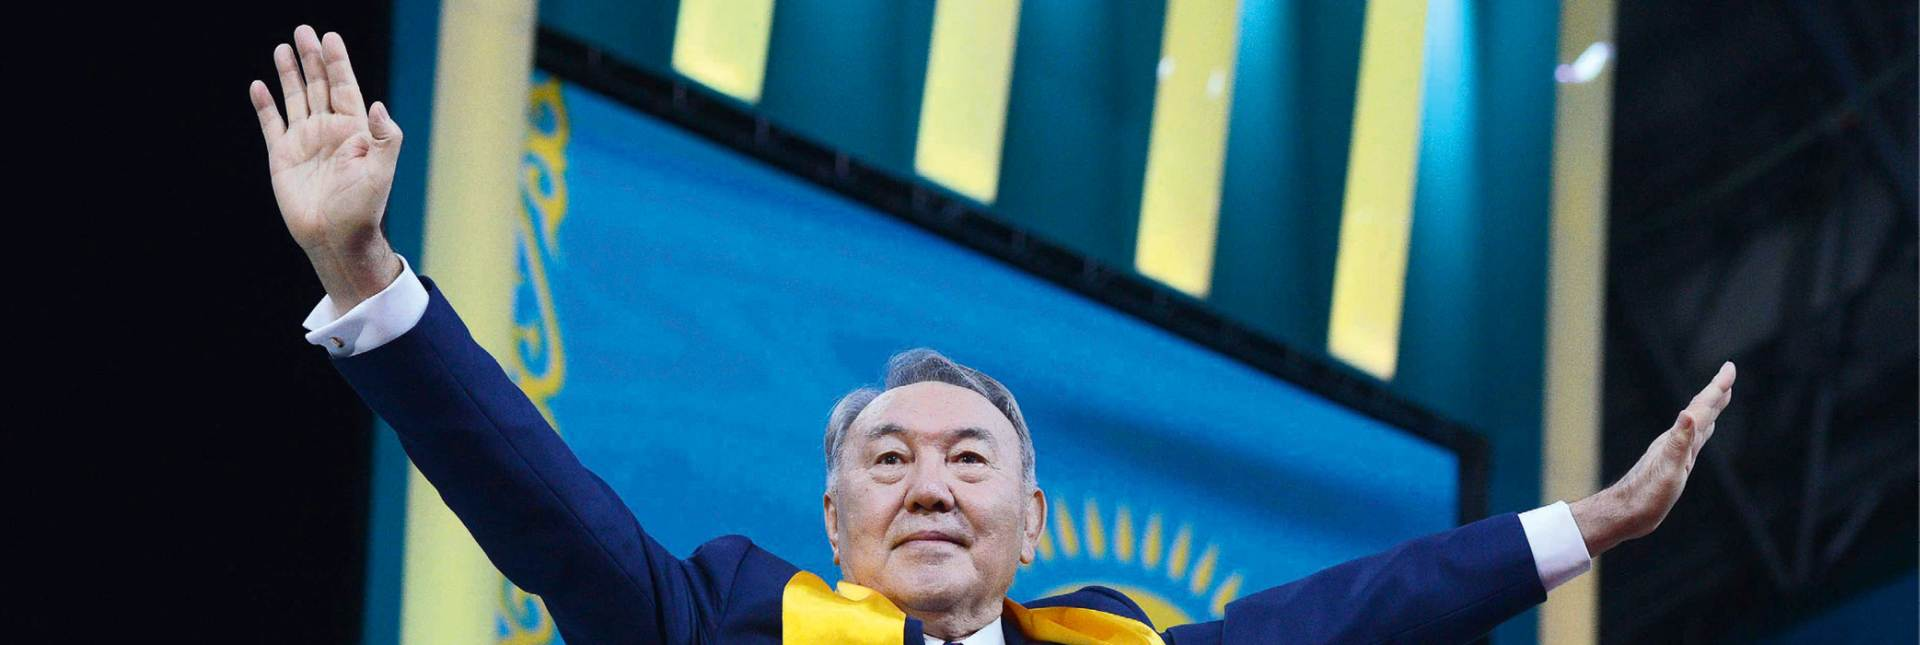 RASPUSTIO DONJI DOM PARLAMENTA: Nazarbajev pozvao na prijevremene izbore